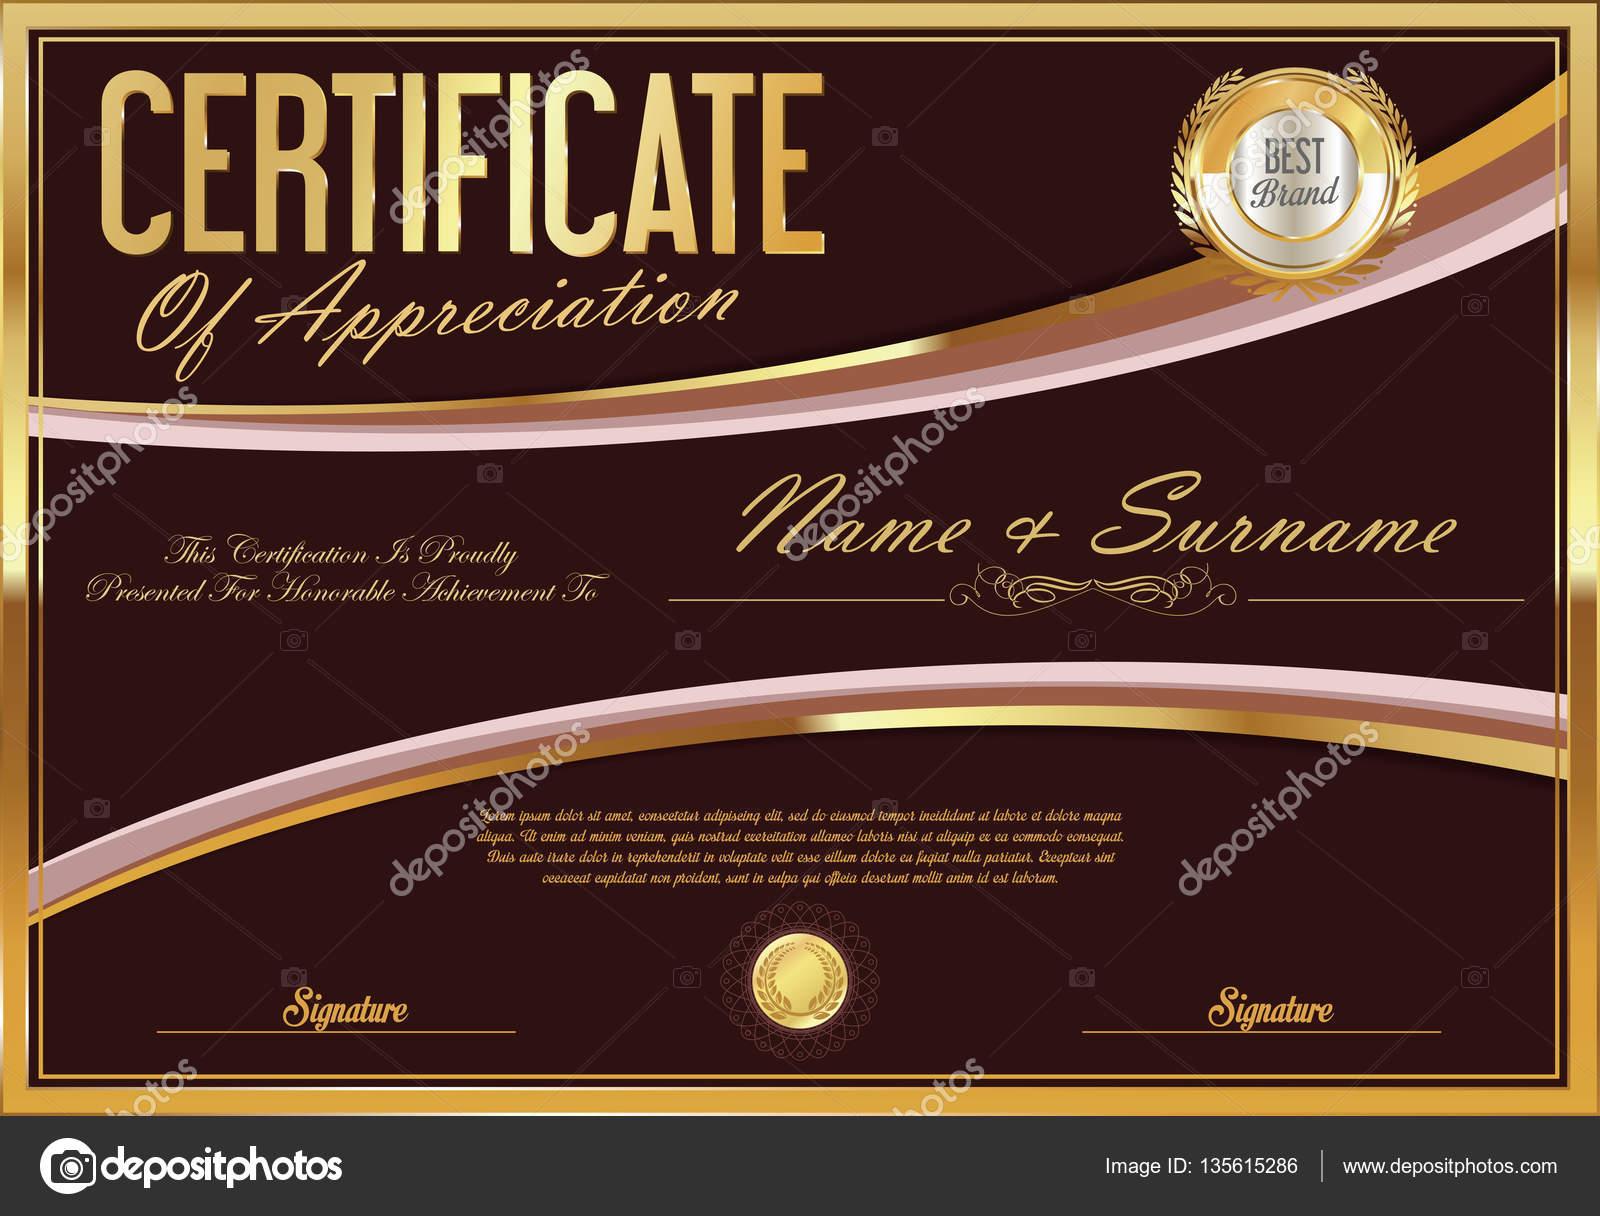 Zertifikat-Vorlage-retro-design — Stockvektor © totallyout #135615286